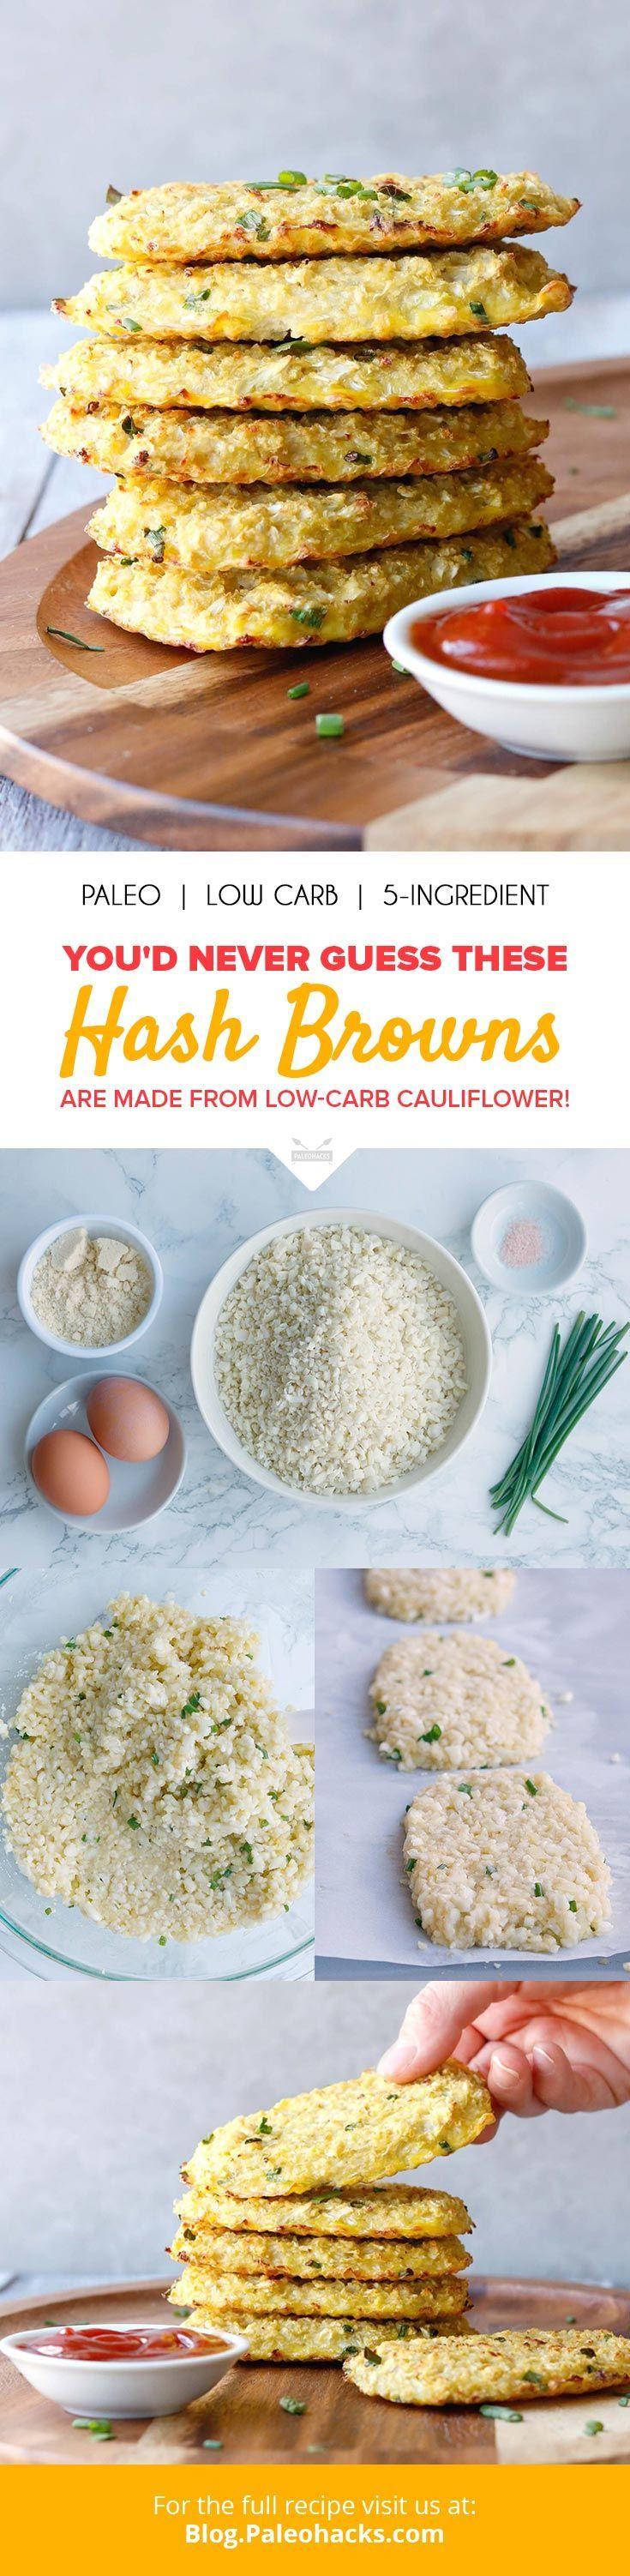 Cauliflower Hash Browns Recipe Healthy recipes